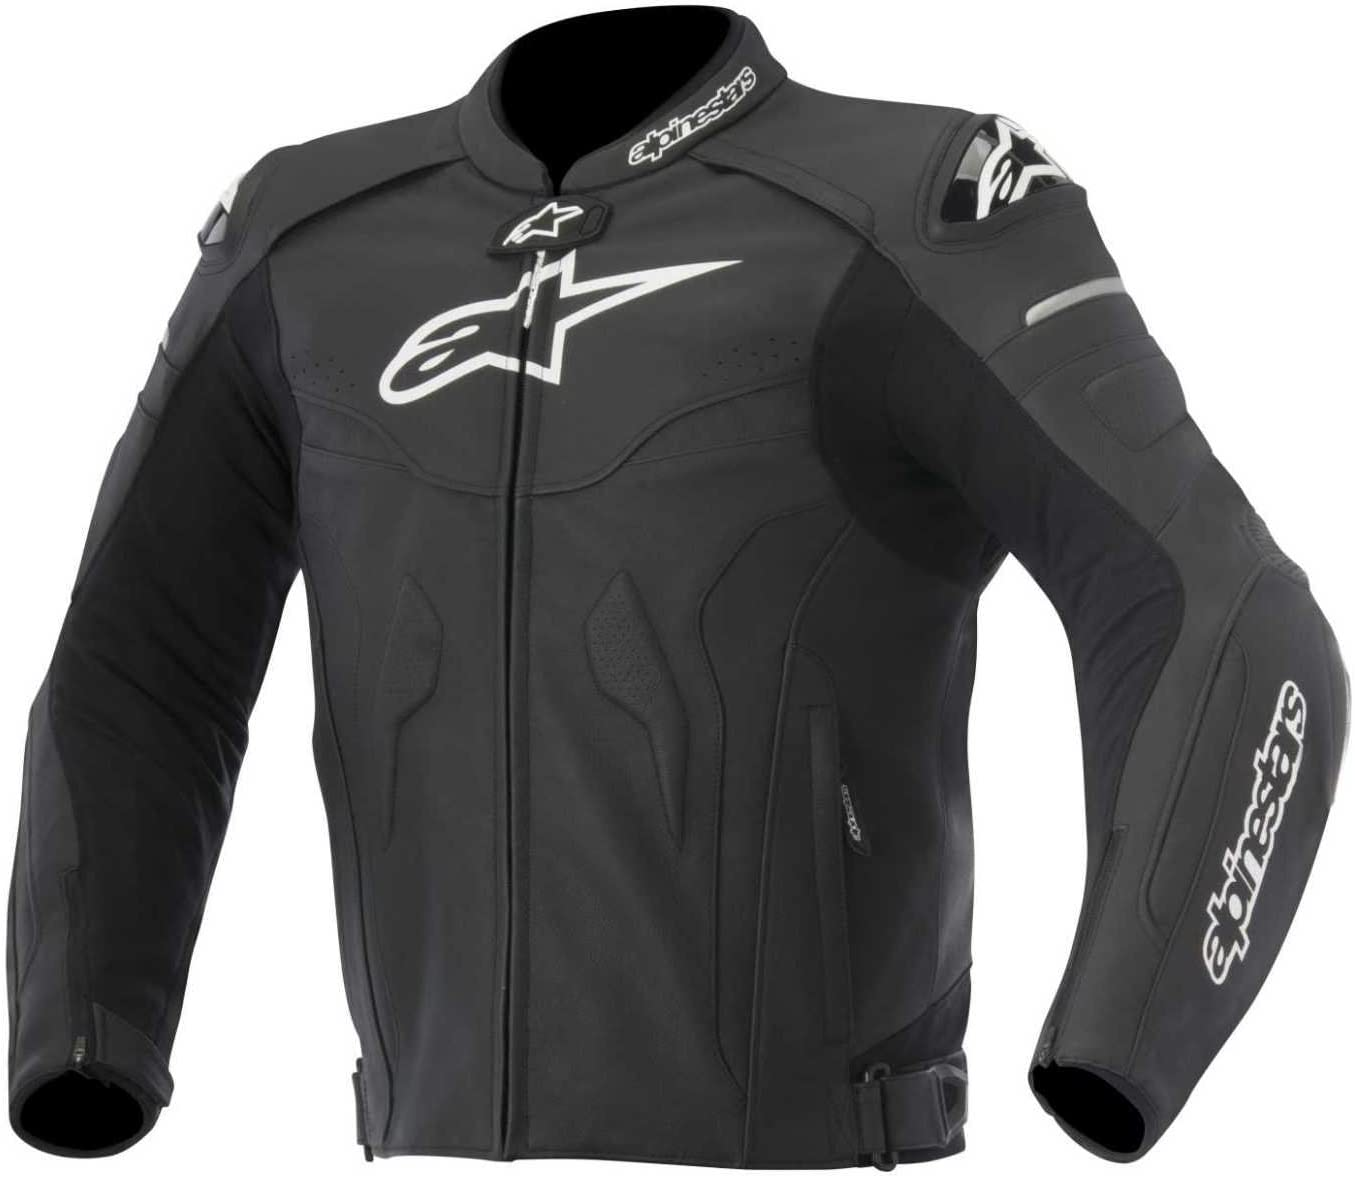 Alpinestars Celer Leather Riding Jacket